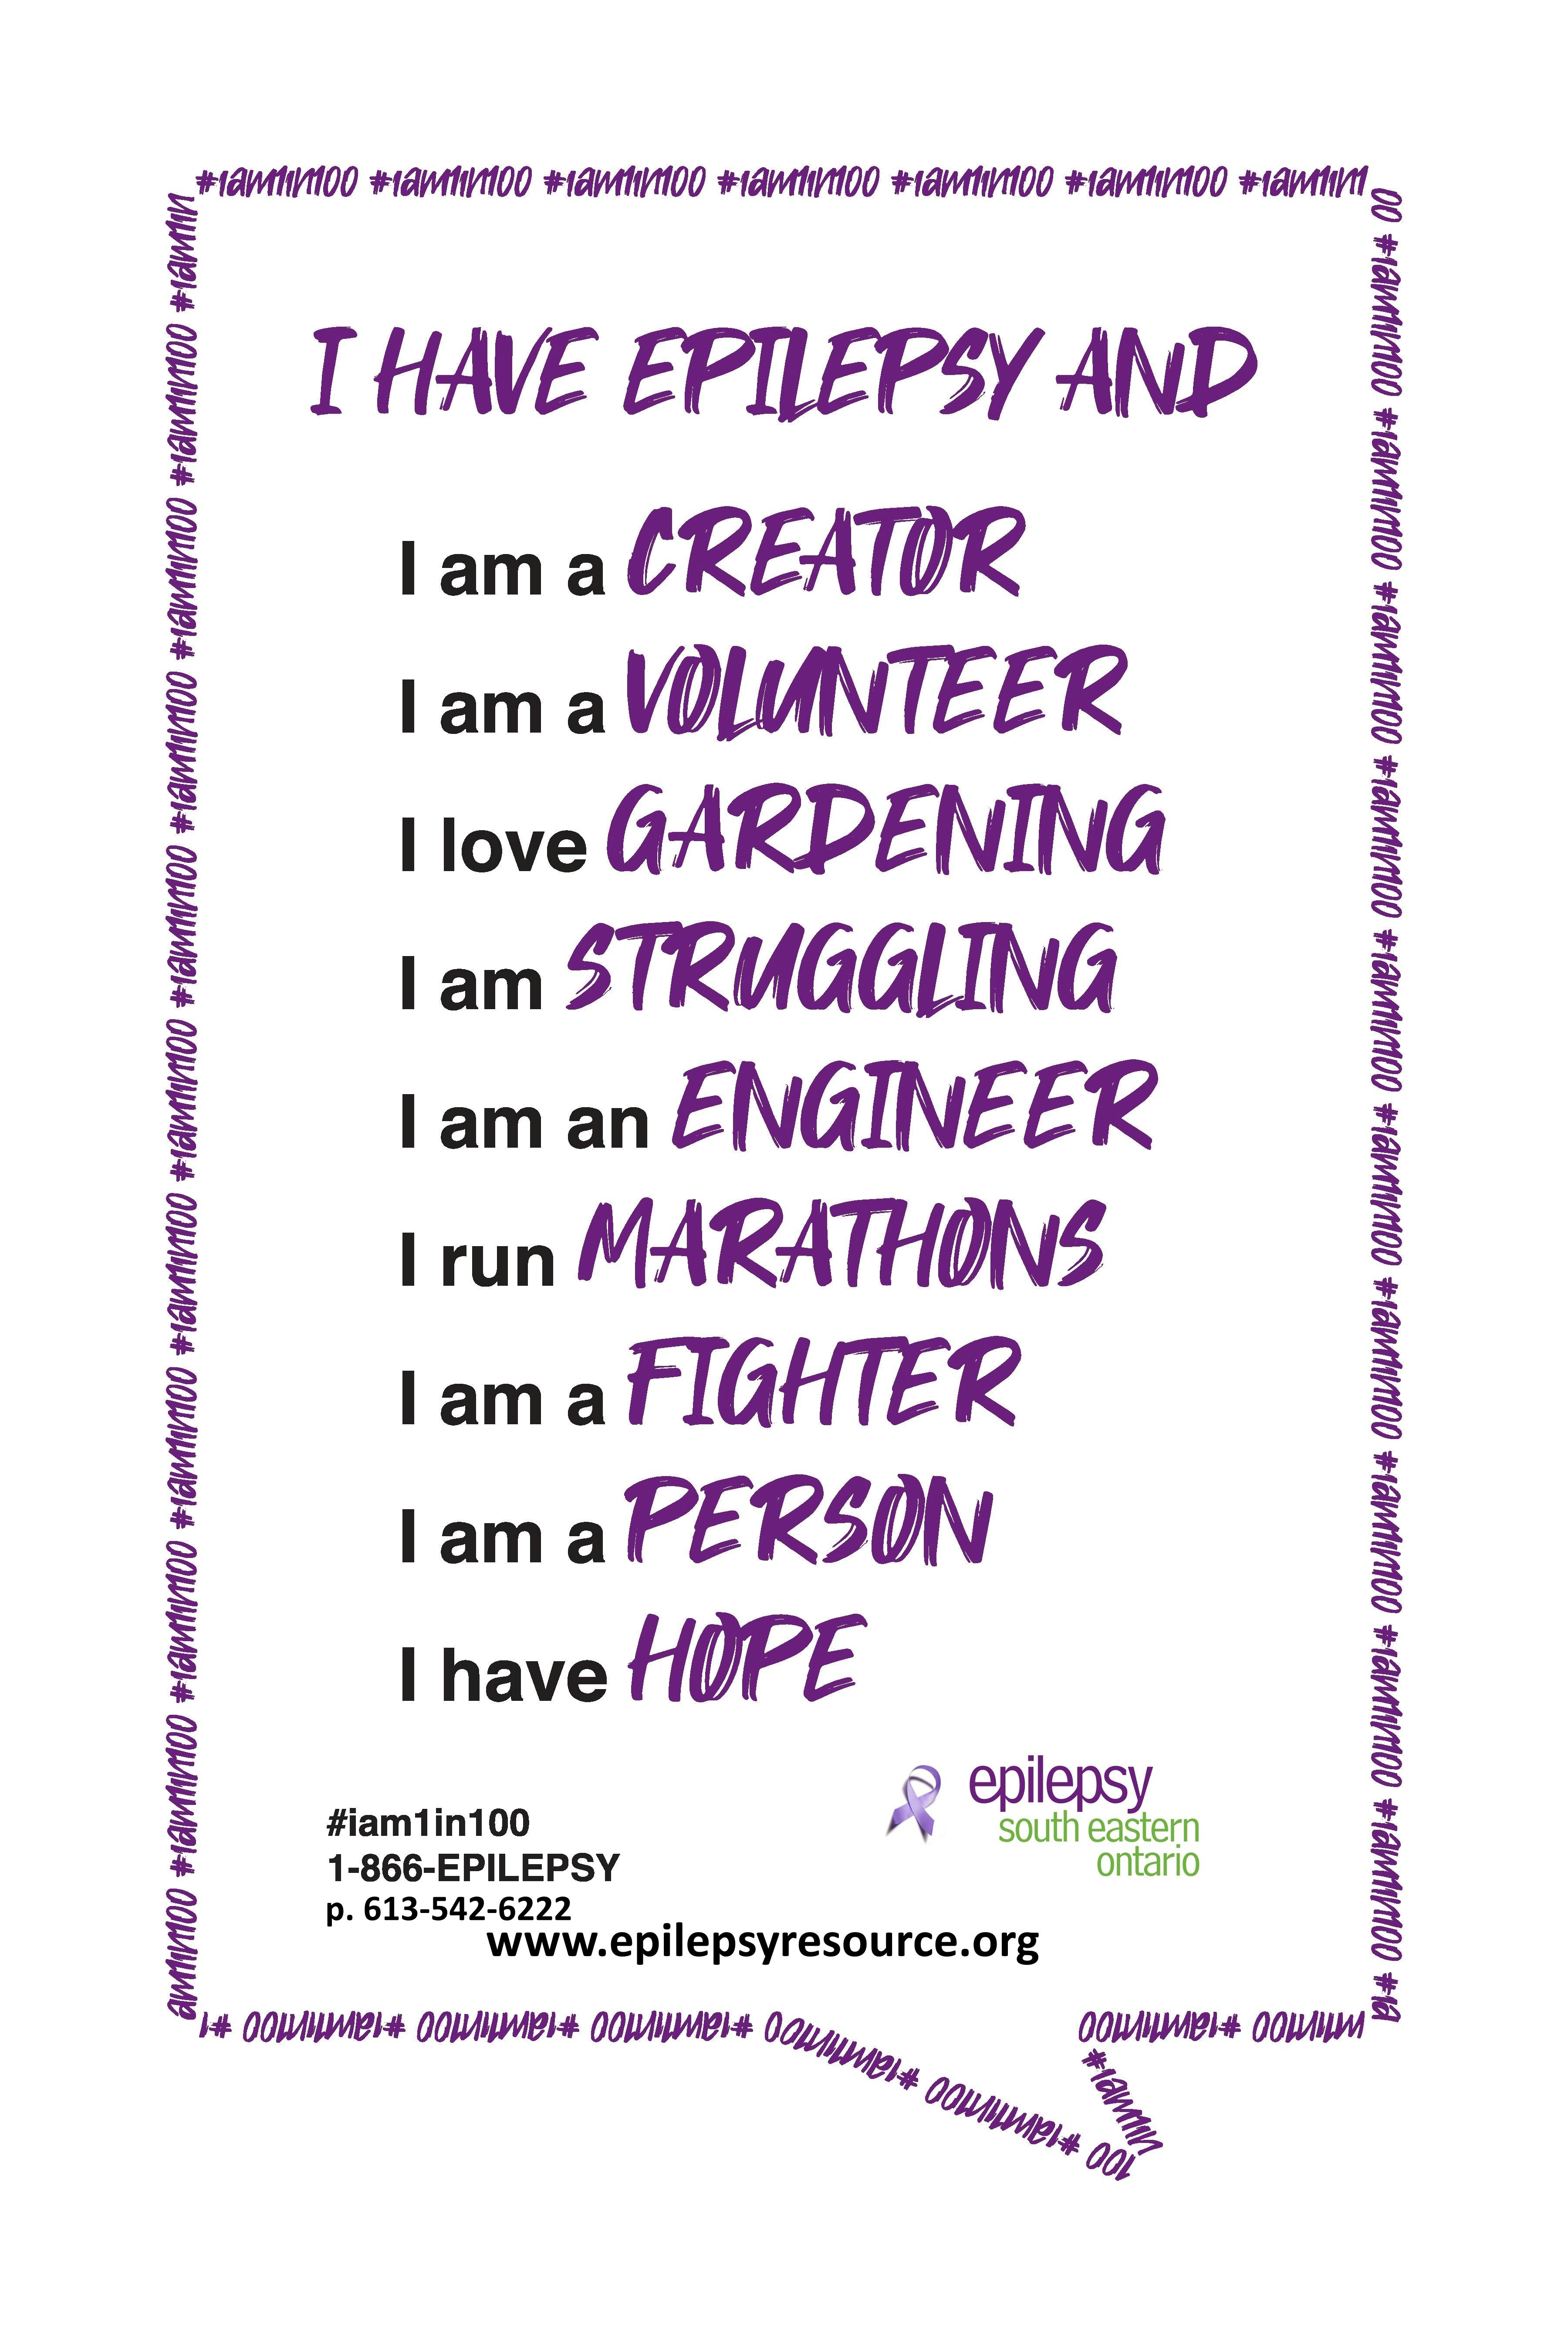 I have epilepsy and...